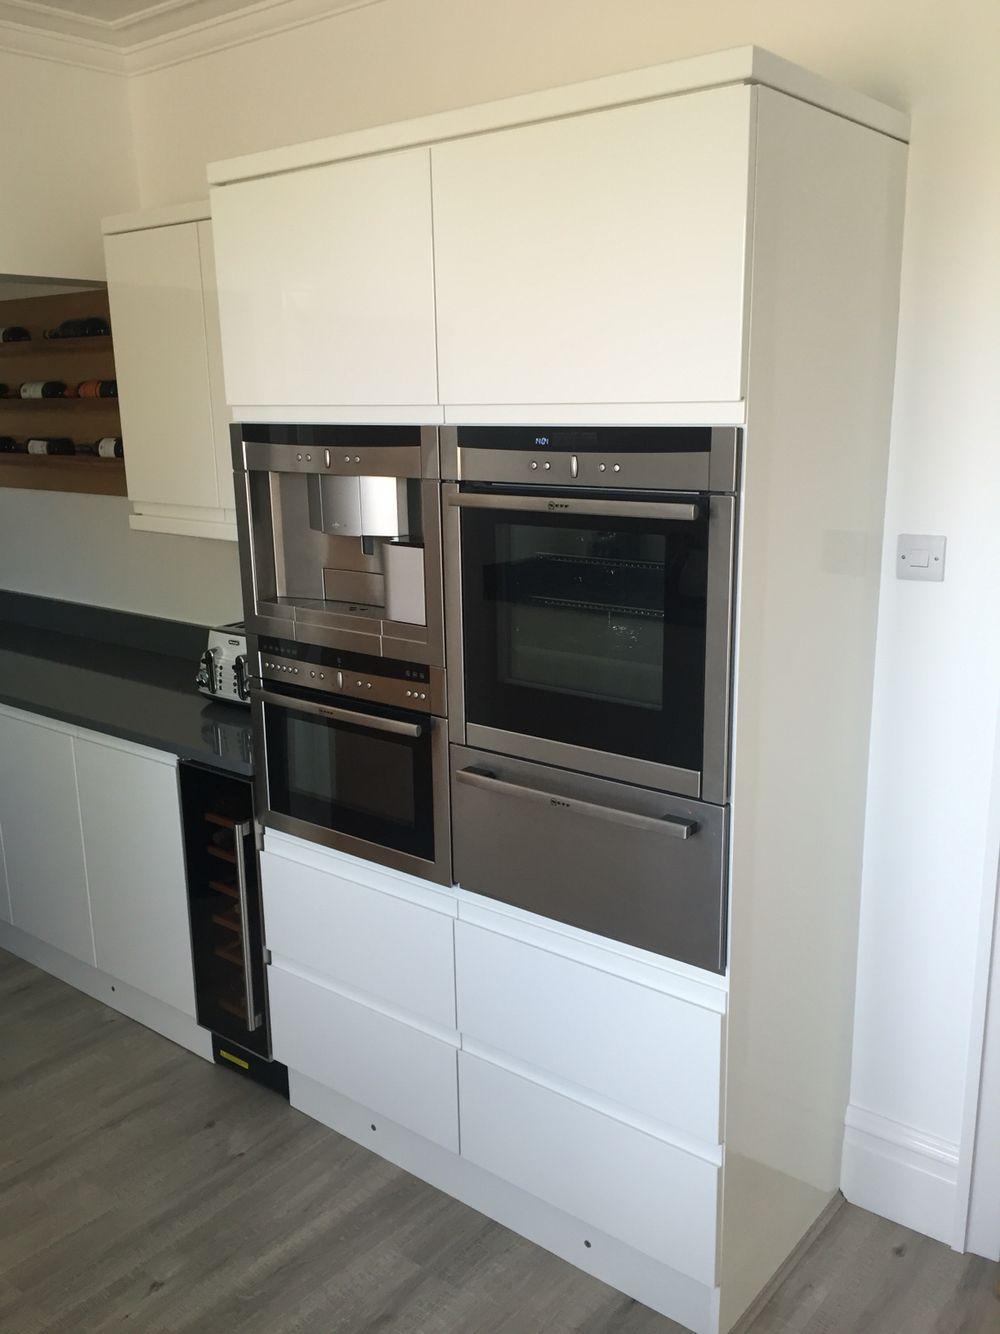 #Neff Coffee Machine, Slide U0026 Hide Oven, Warming Drawer U0026 Microwave Oven